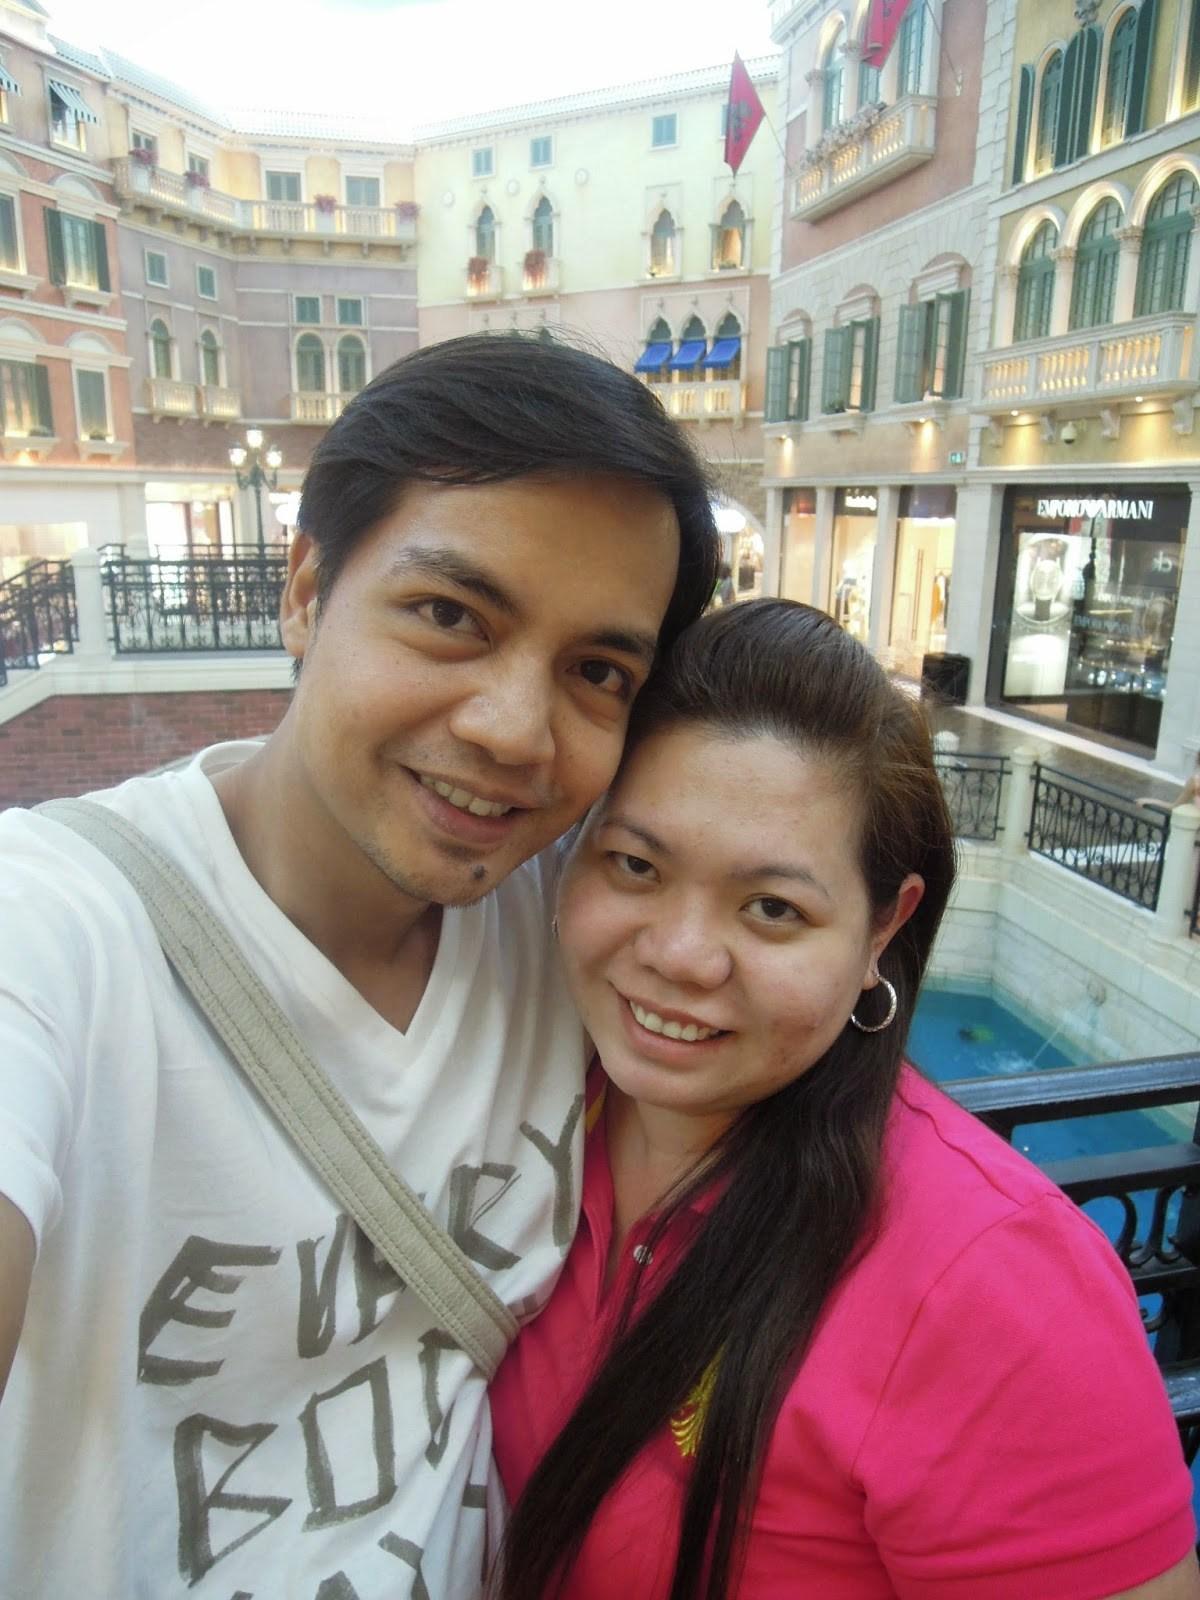 A couple traveler and blogger exploring The Venetian Hotel Macao